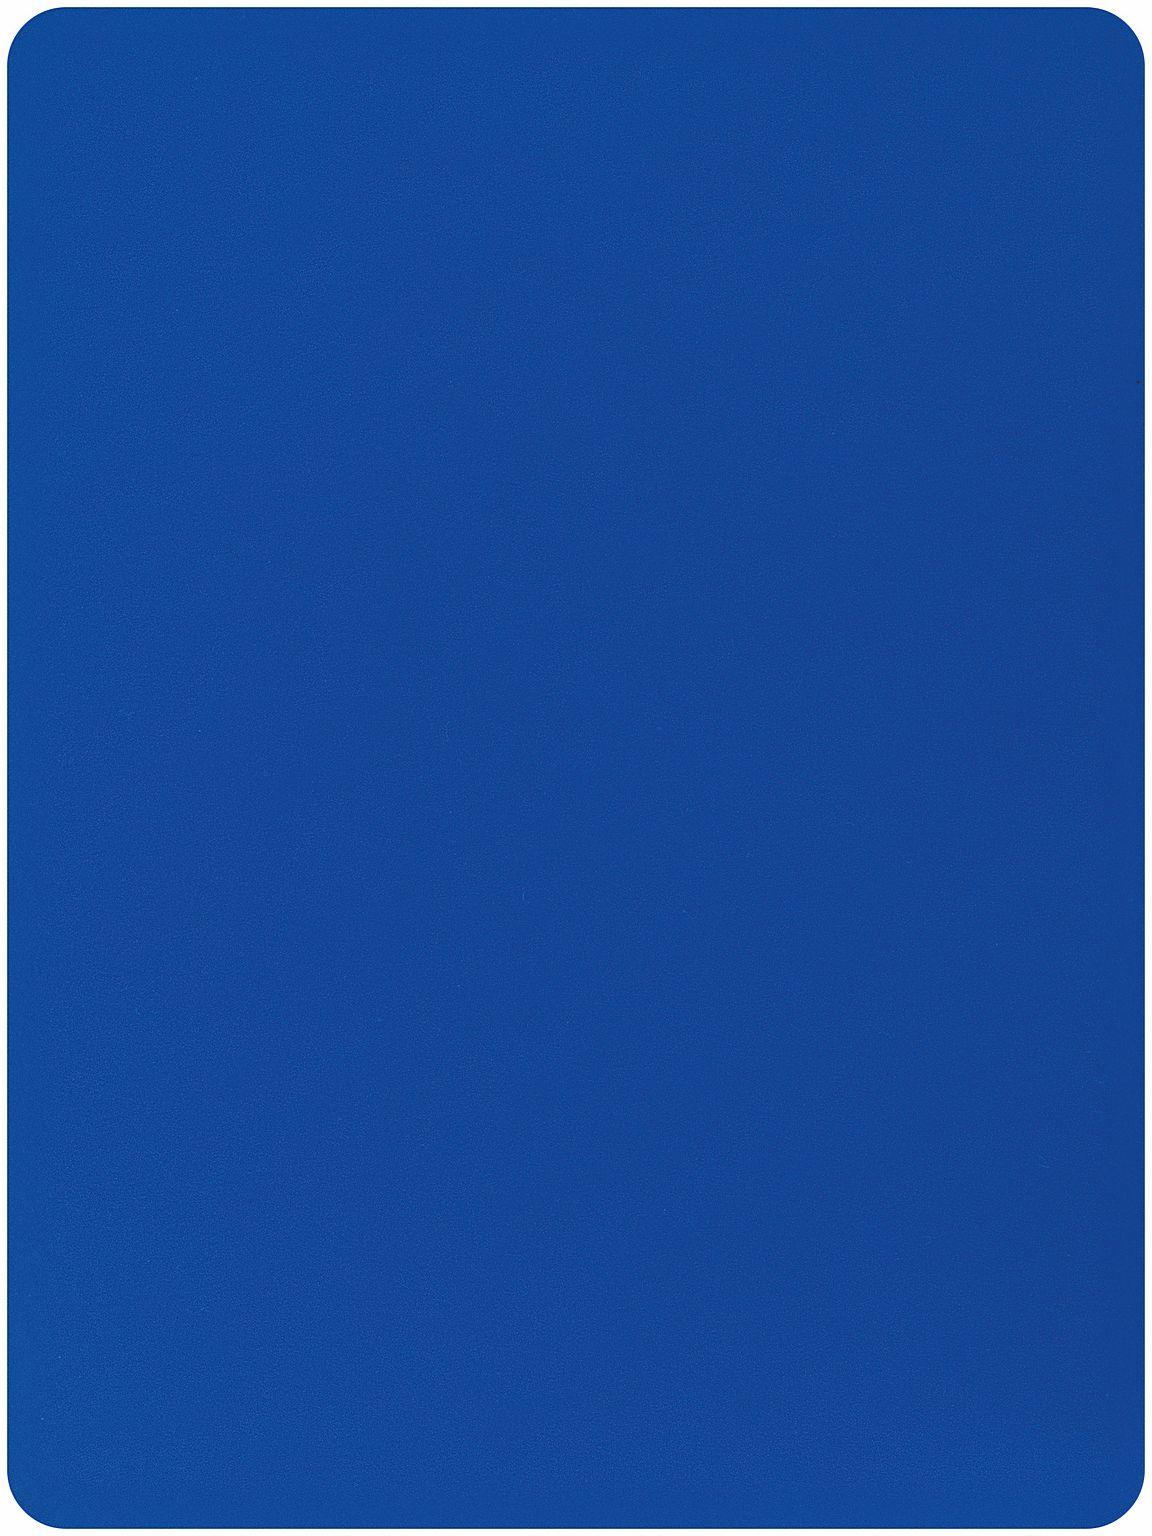 Handball Blaue Karte.Erima Blaue Karte Handball